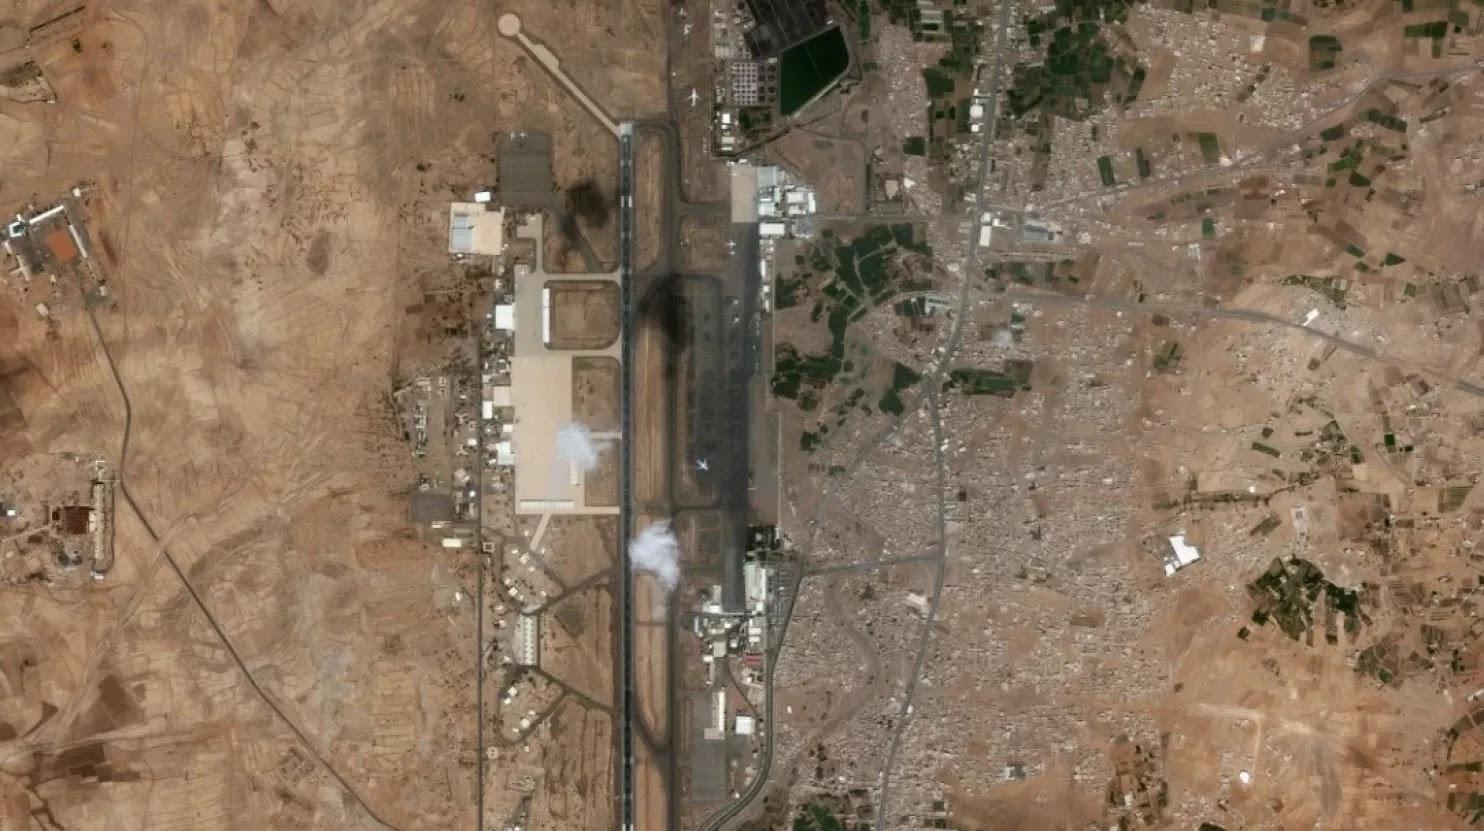 As imagens de satélite do Aeroporto Internacional de Sanaa tomada dia 22 de março